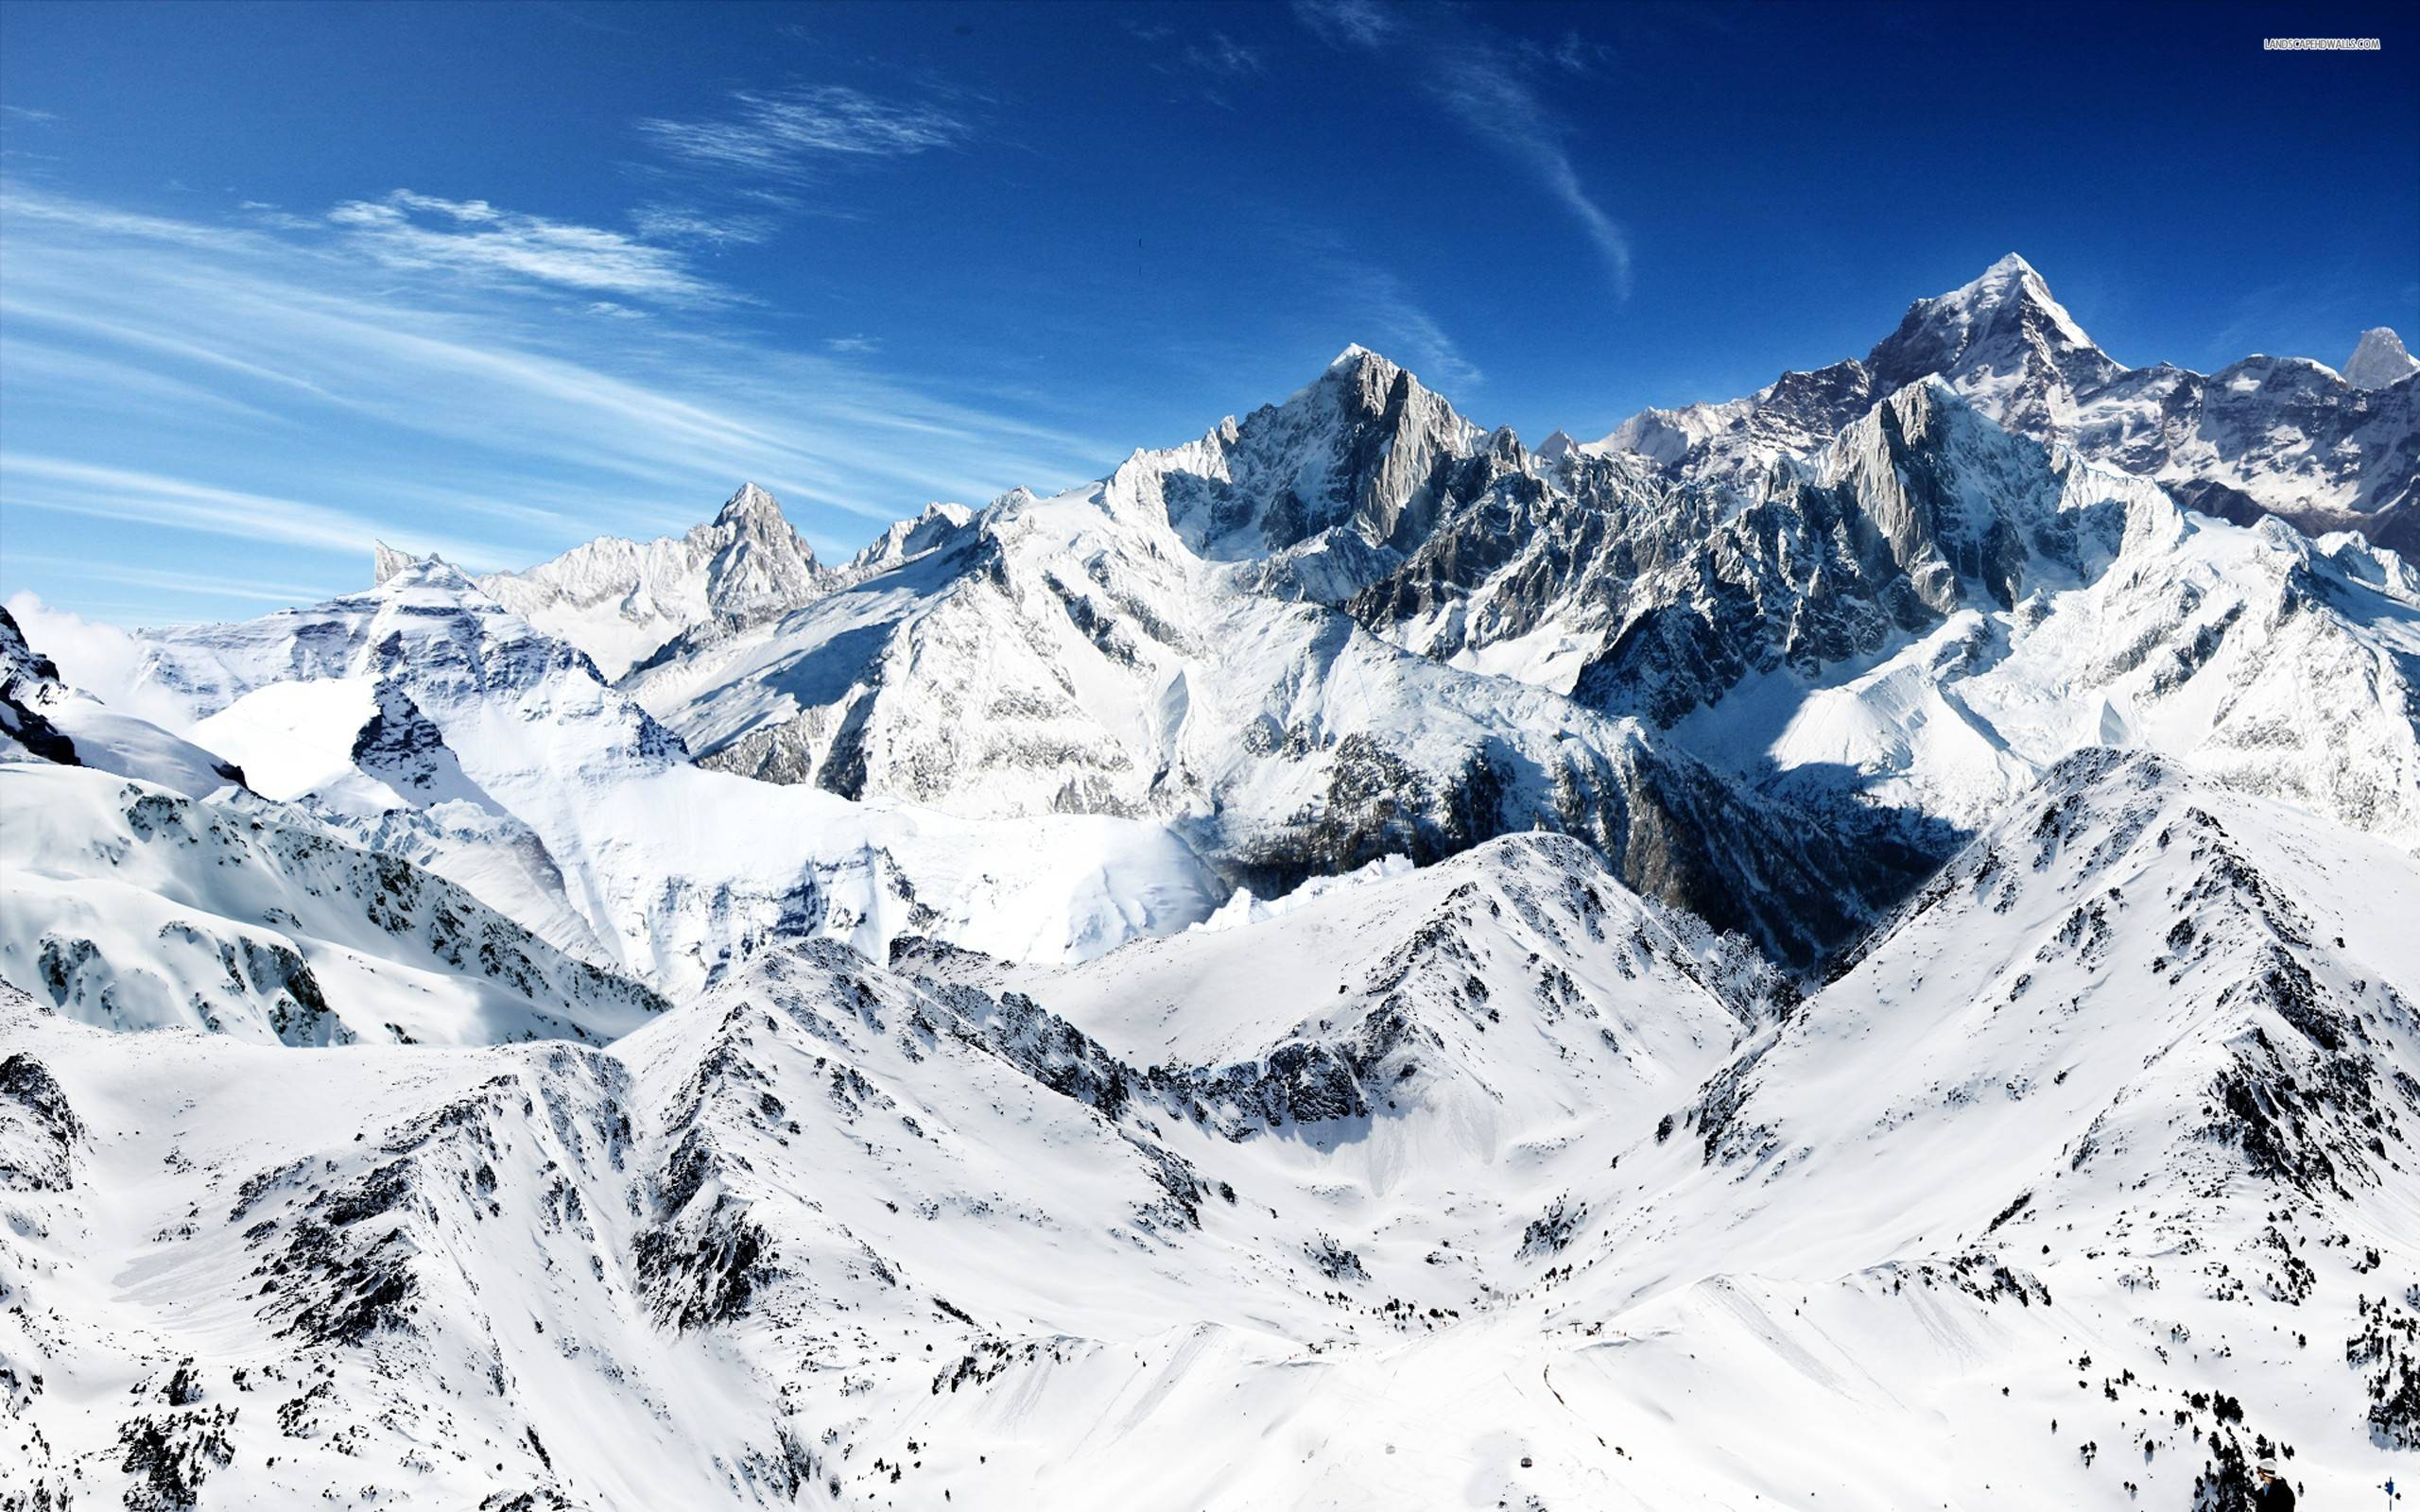 snow mountain wallpaper hd - photo #3